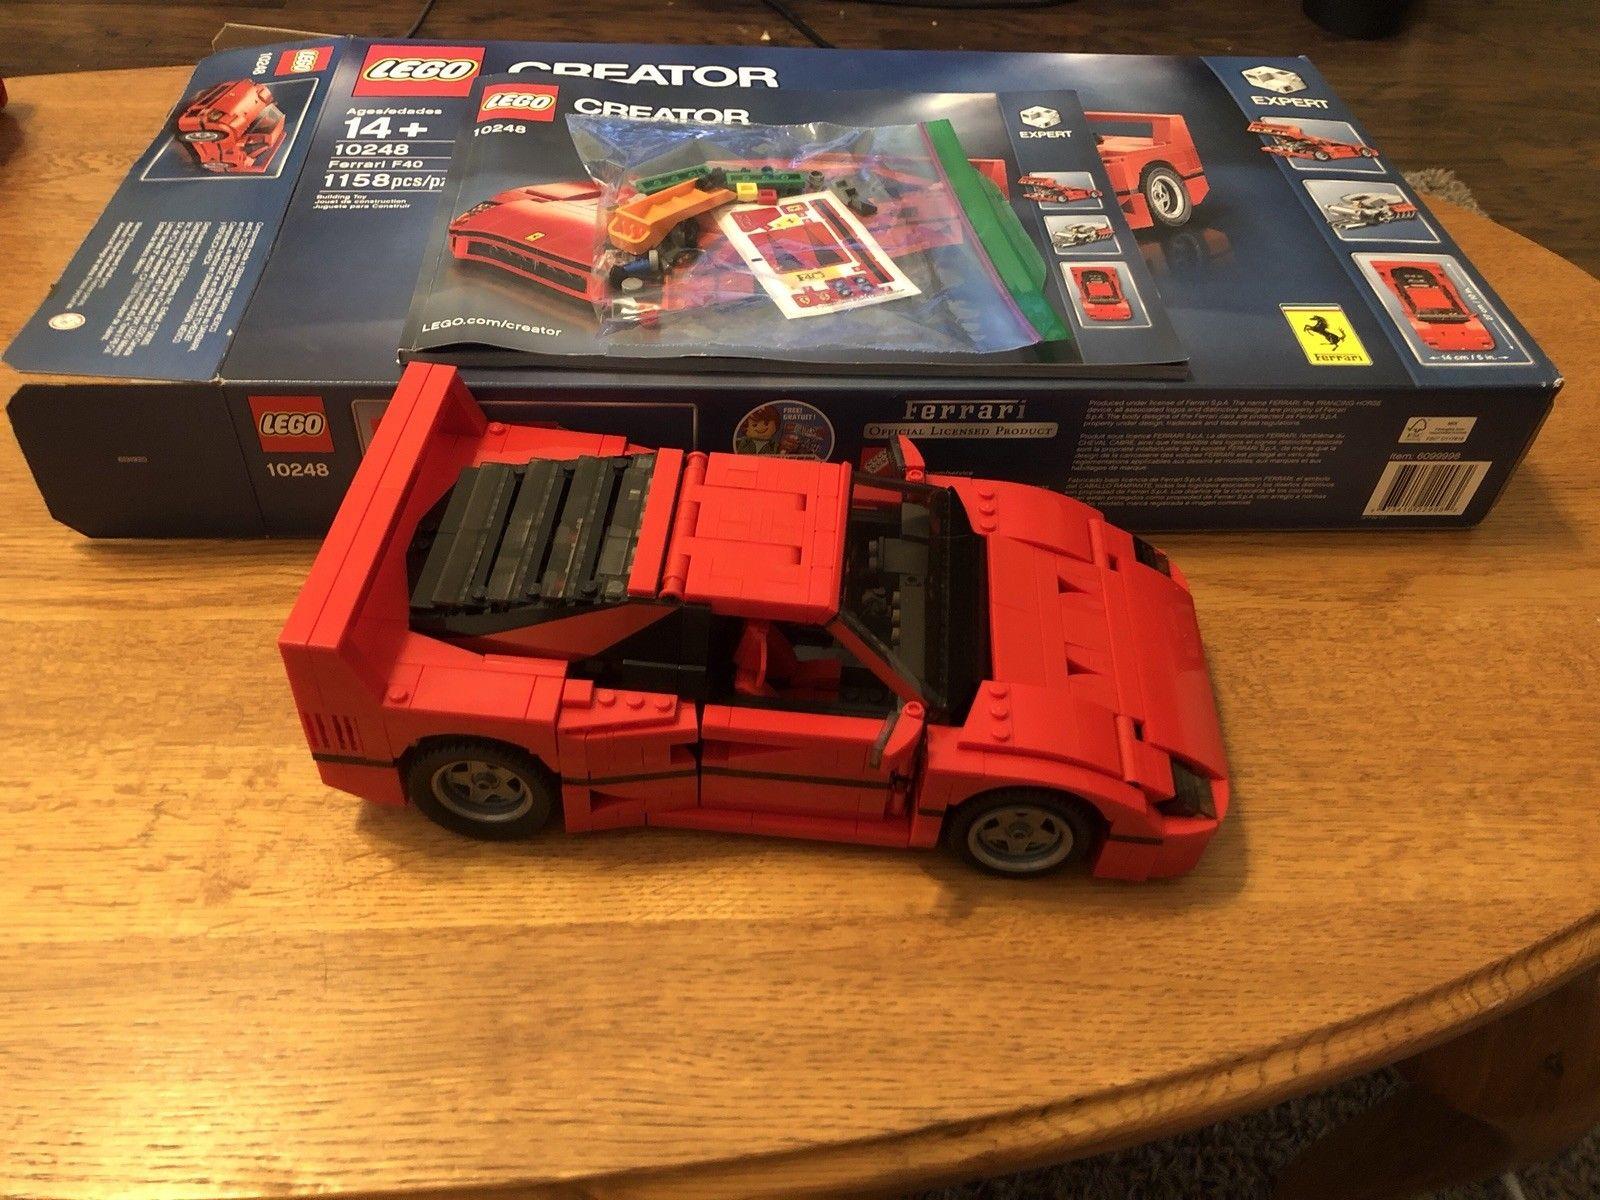 Great Lego Creator Ferrari F40 10248 Complete With Box And